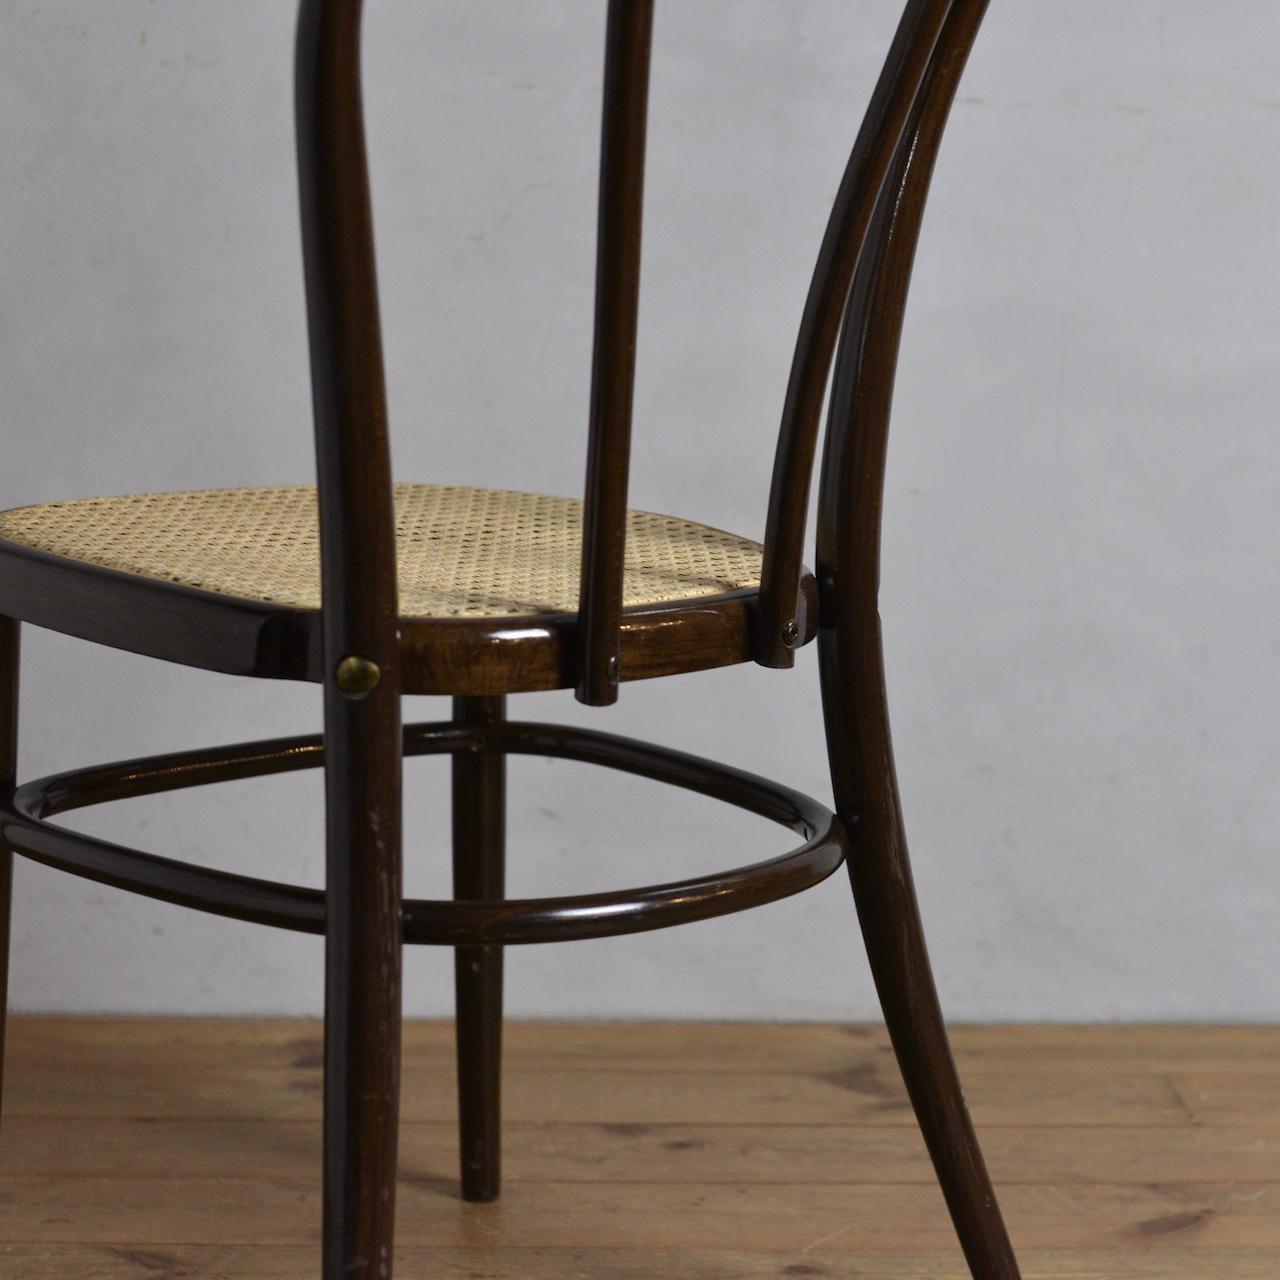 Bentwood Chair / ベントウッド チェア 【A】 〈ダイニングチェア・ラタンチェア・カフェチェア〉